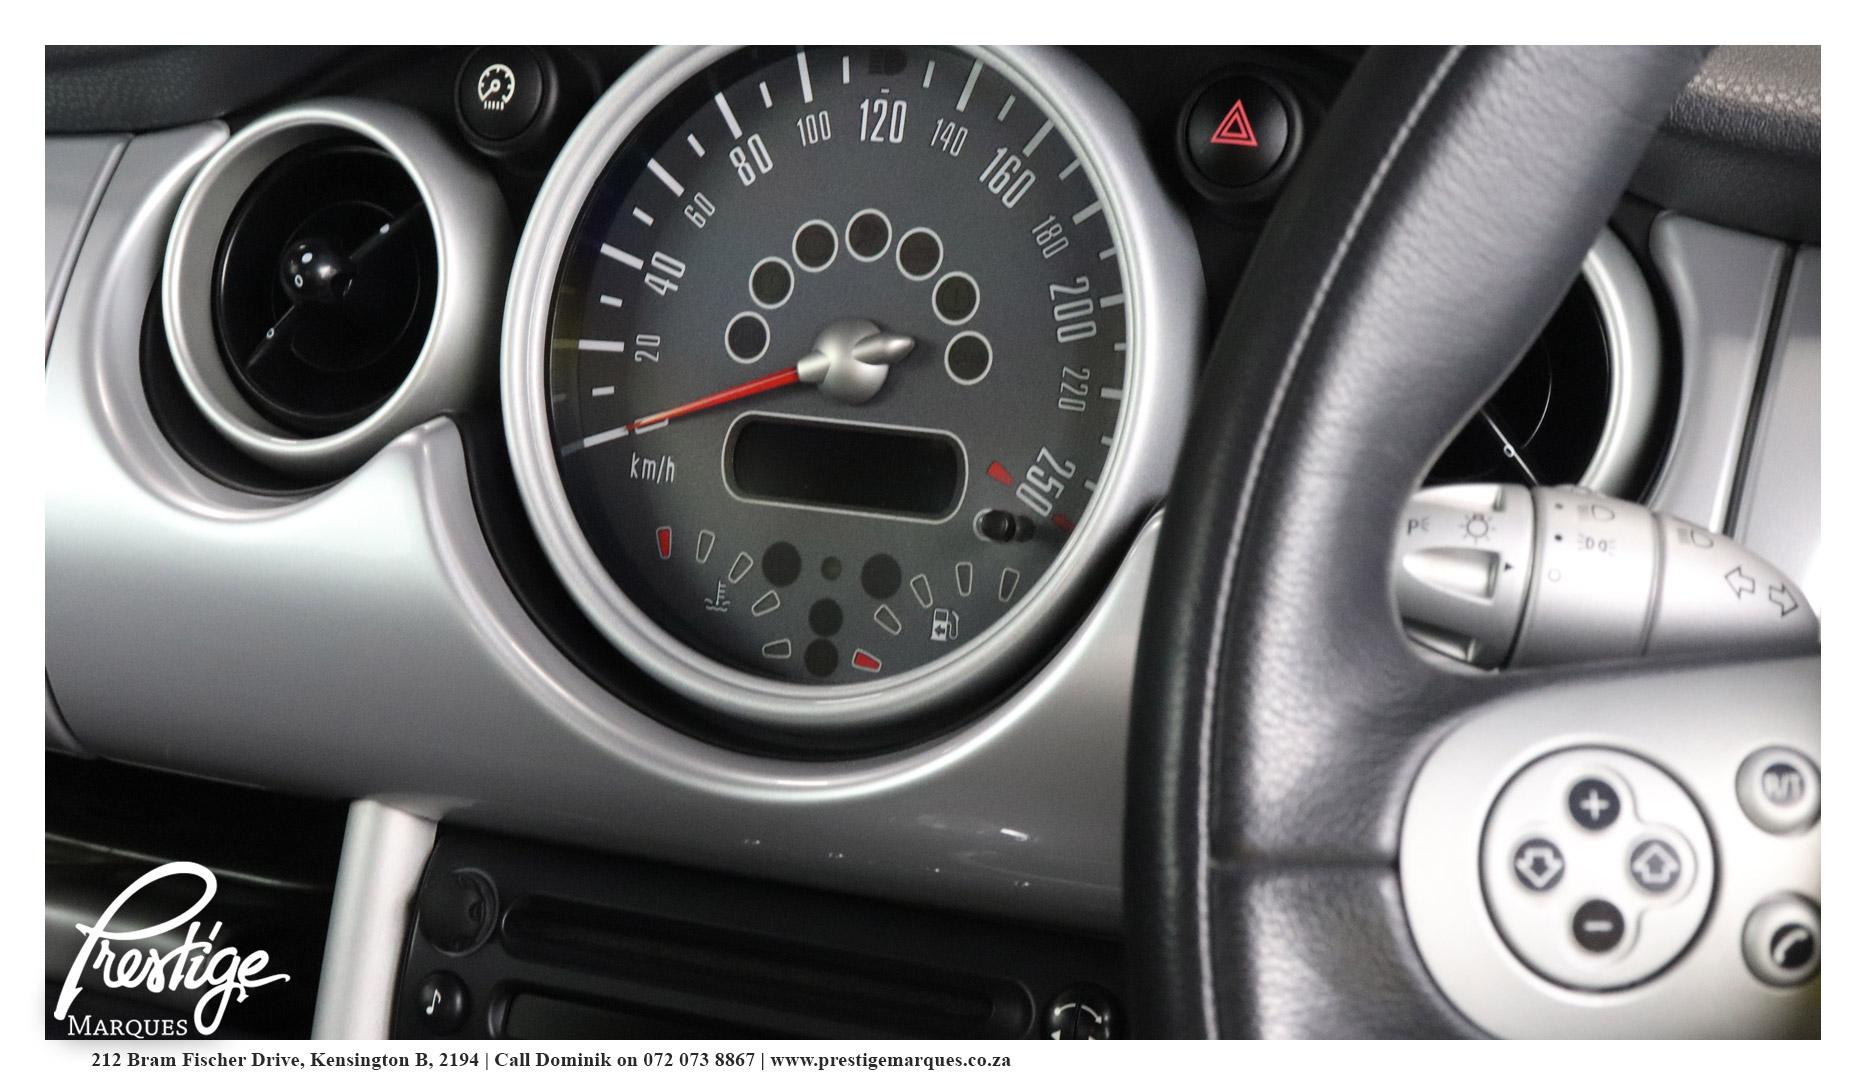 2006-Mini-Cooper-S-GP-Johon-Cooper-Works- Prestige-Marques-Randburg-Sandton-18